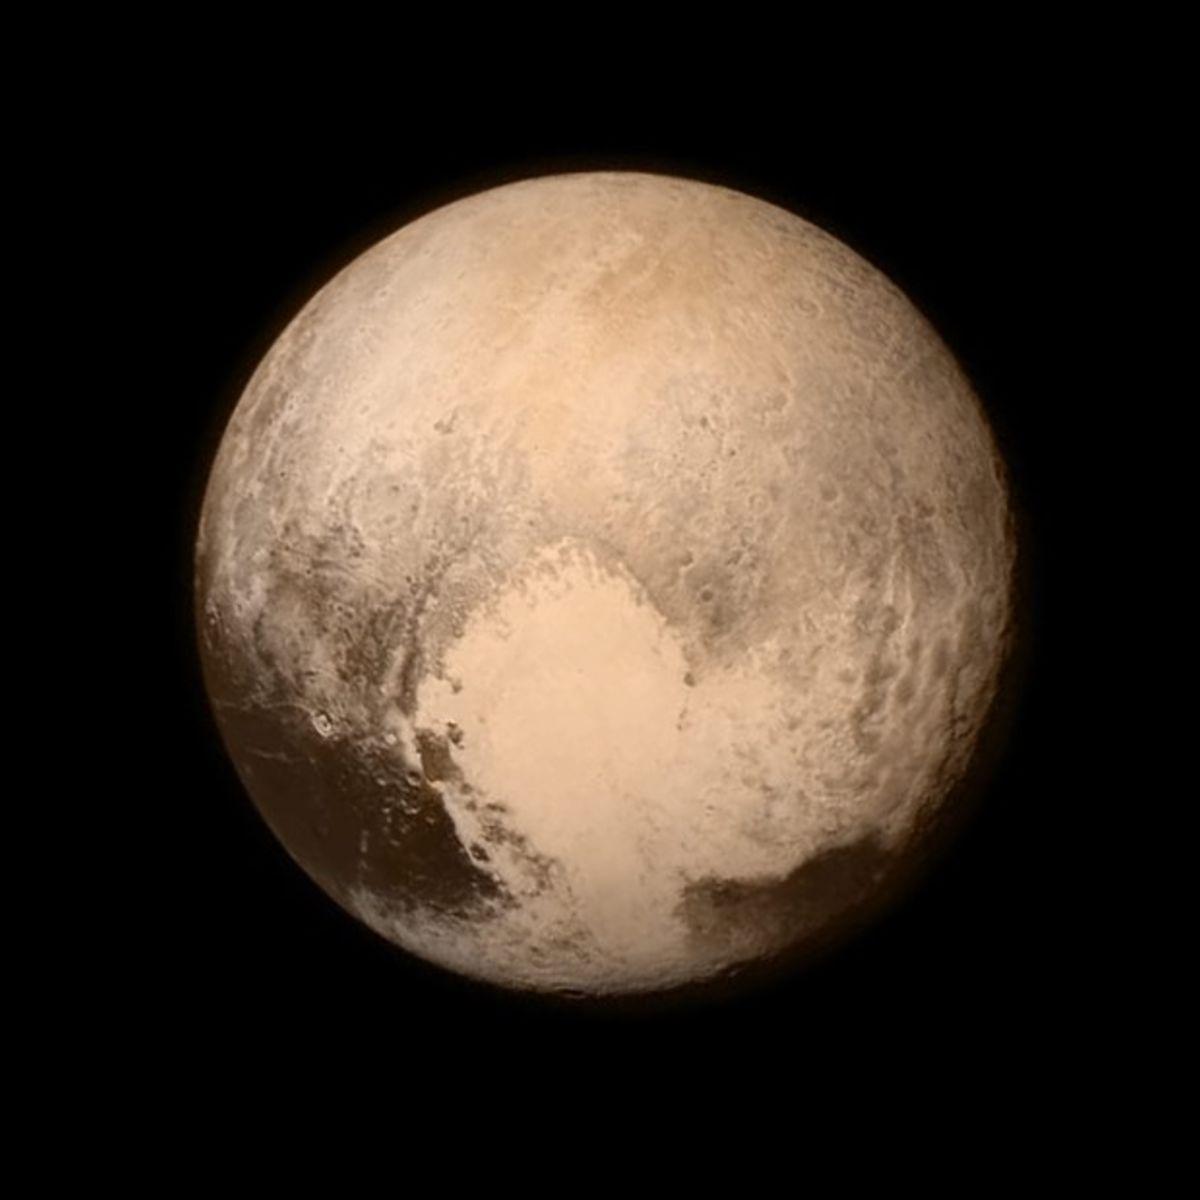 150714084003-01-pluto-horizon-0714-super-169.jpg